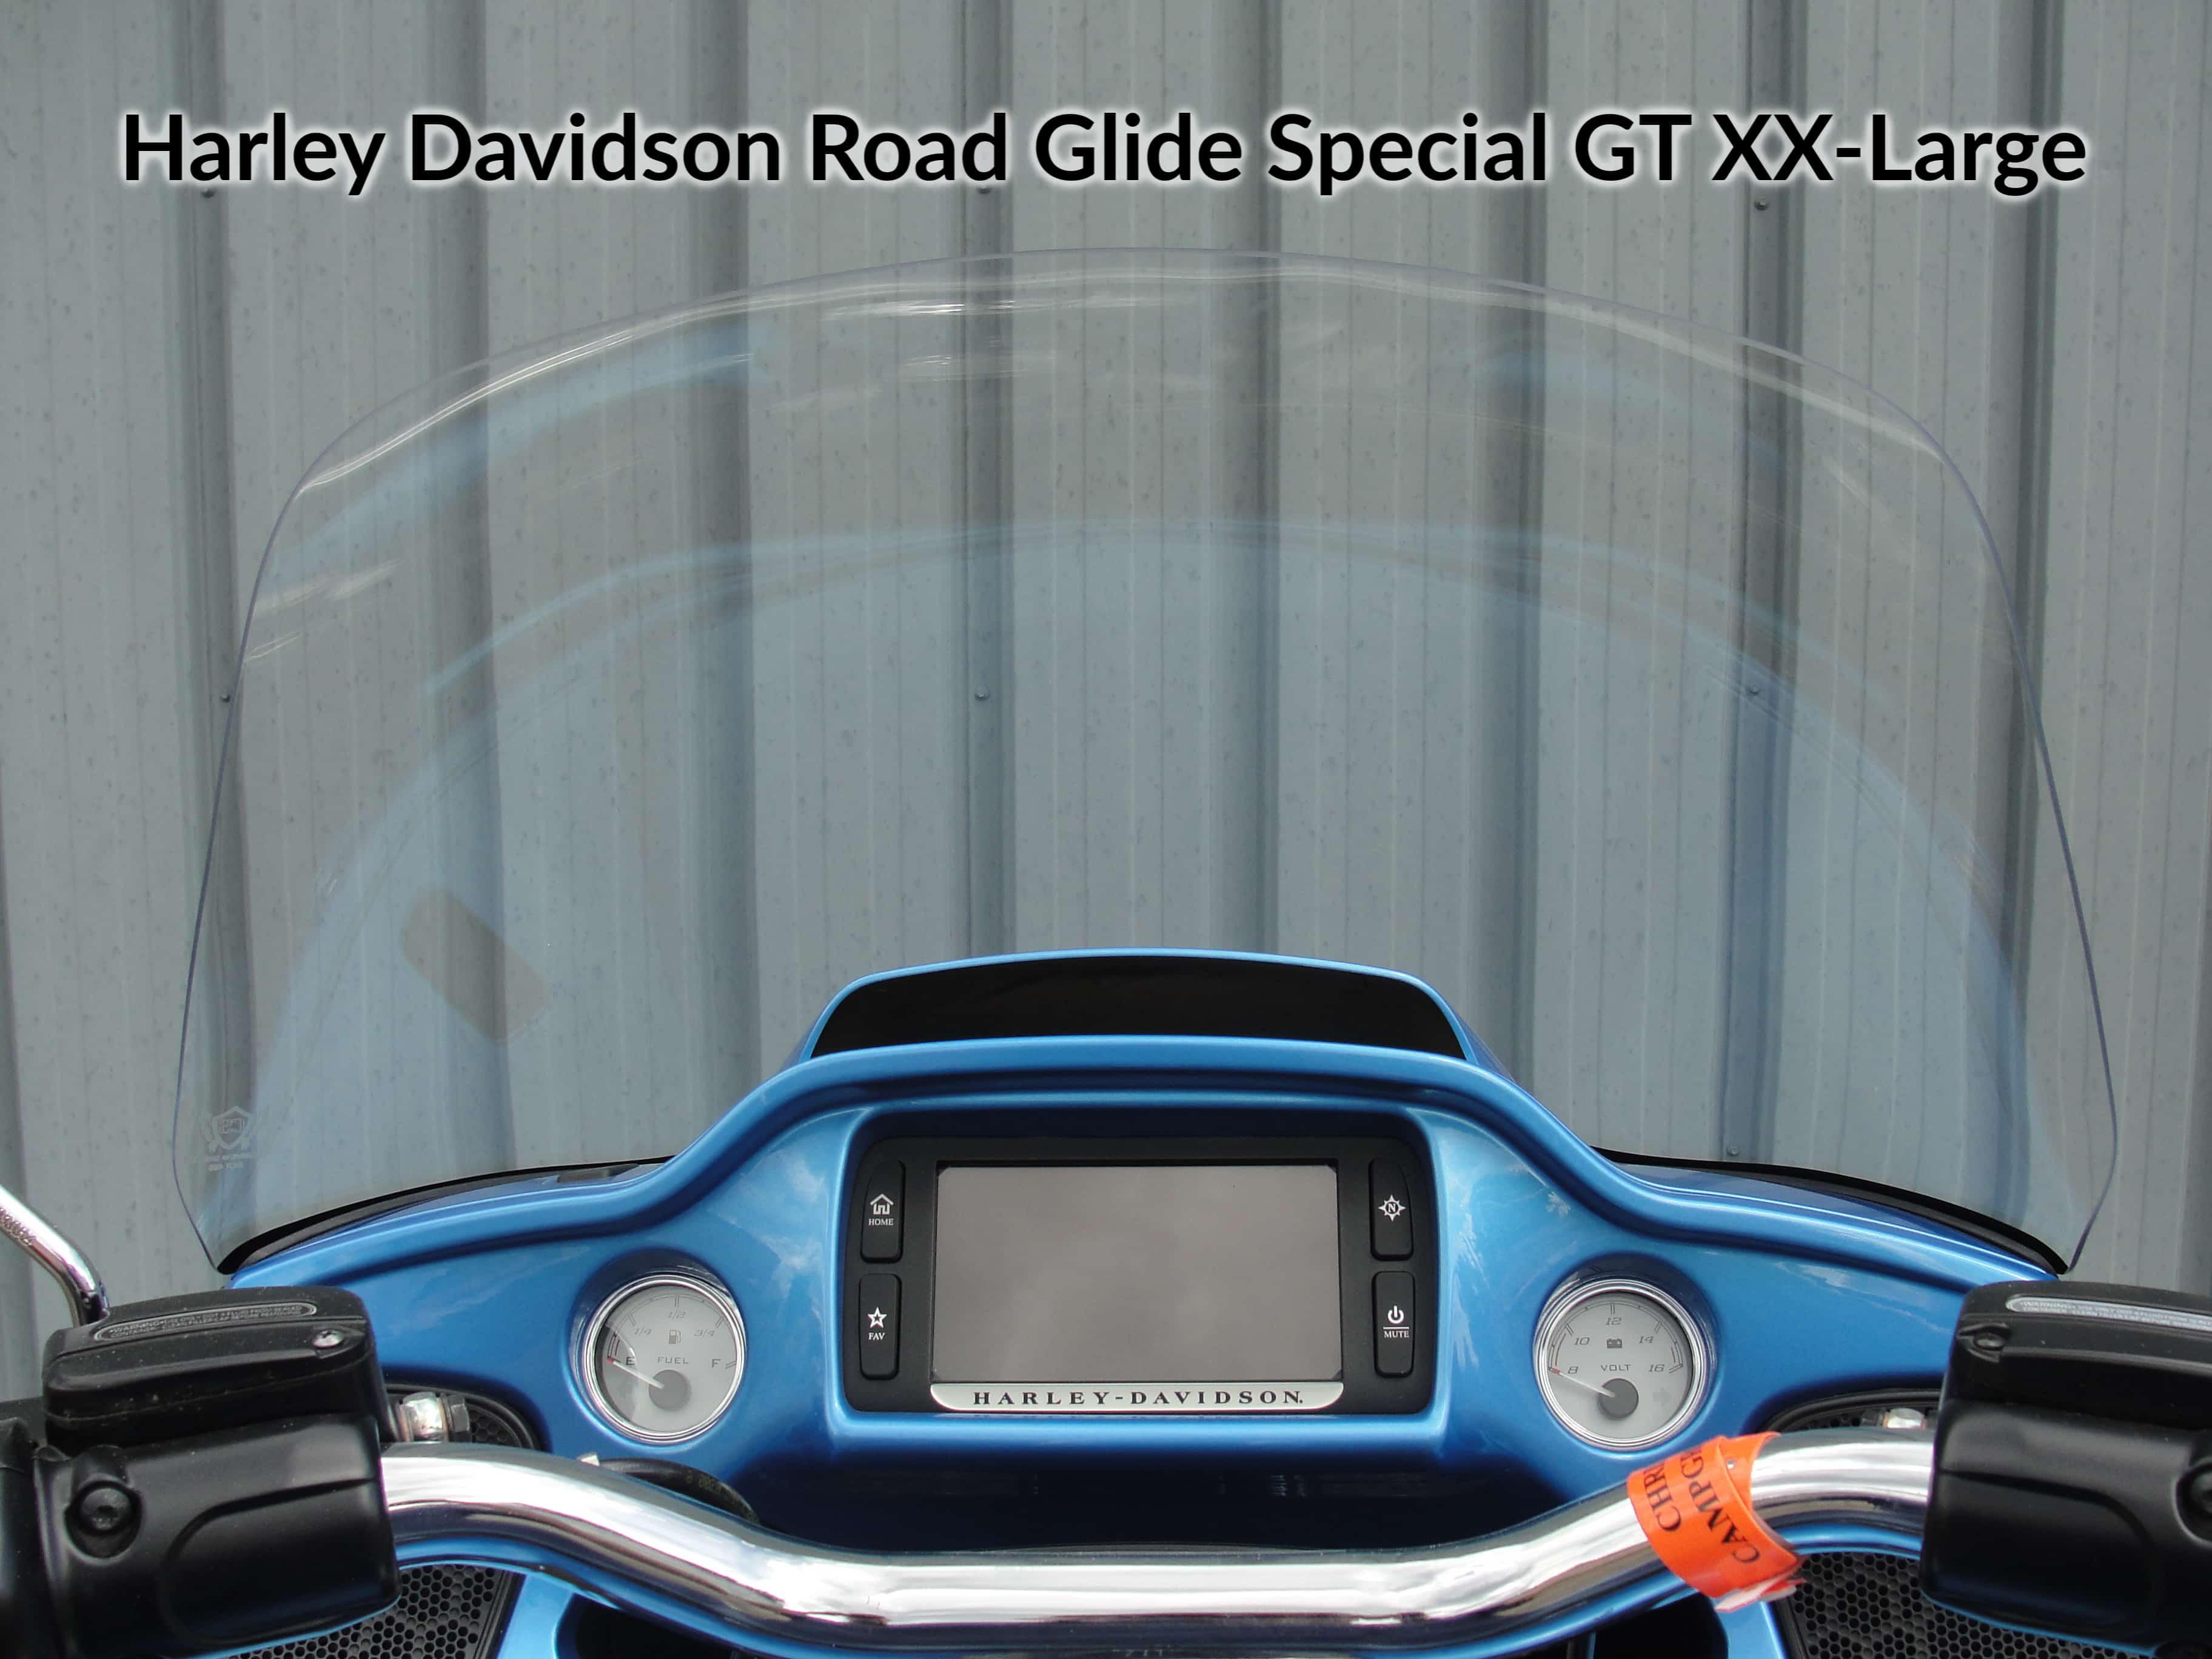 Harley Davidson Road Glide Windshield GT XX-Large